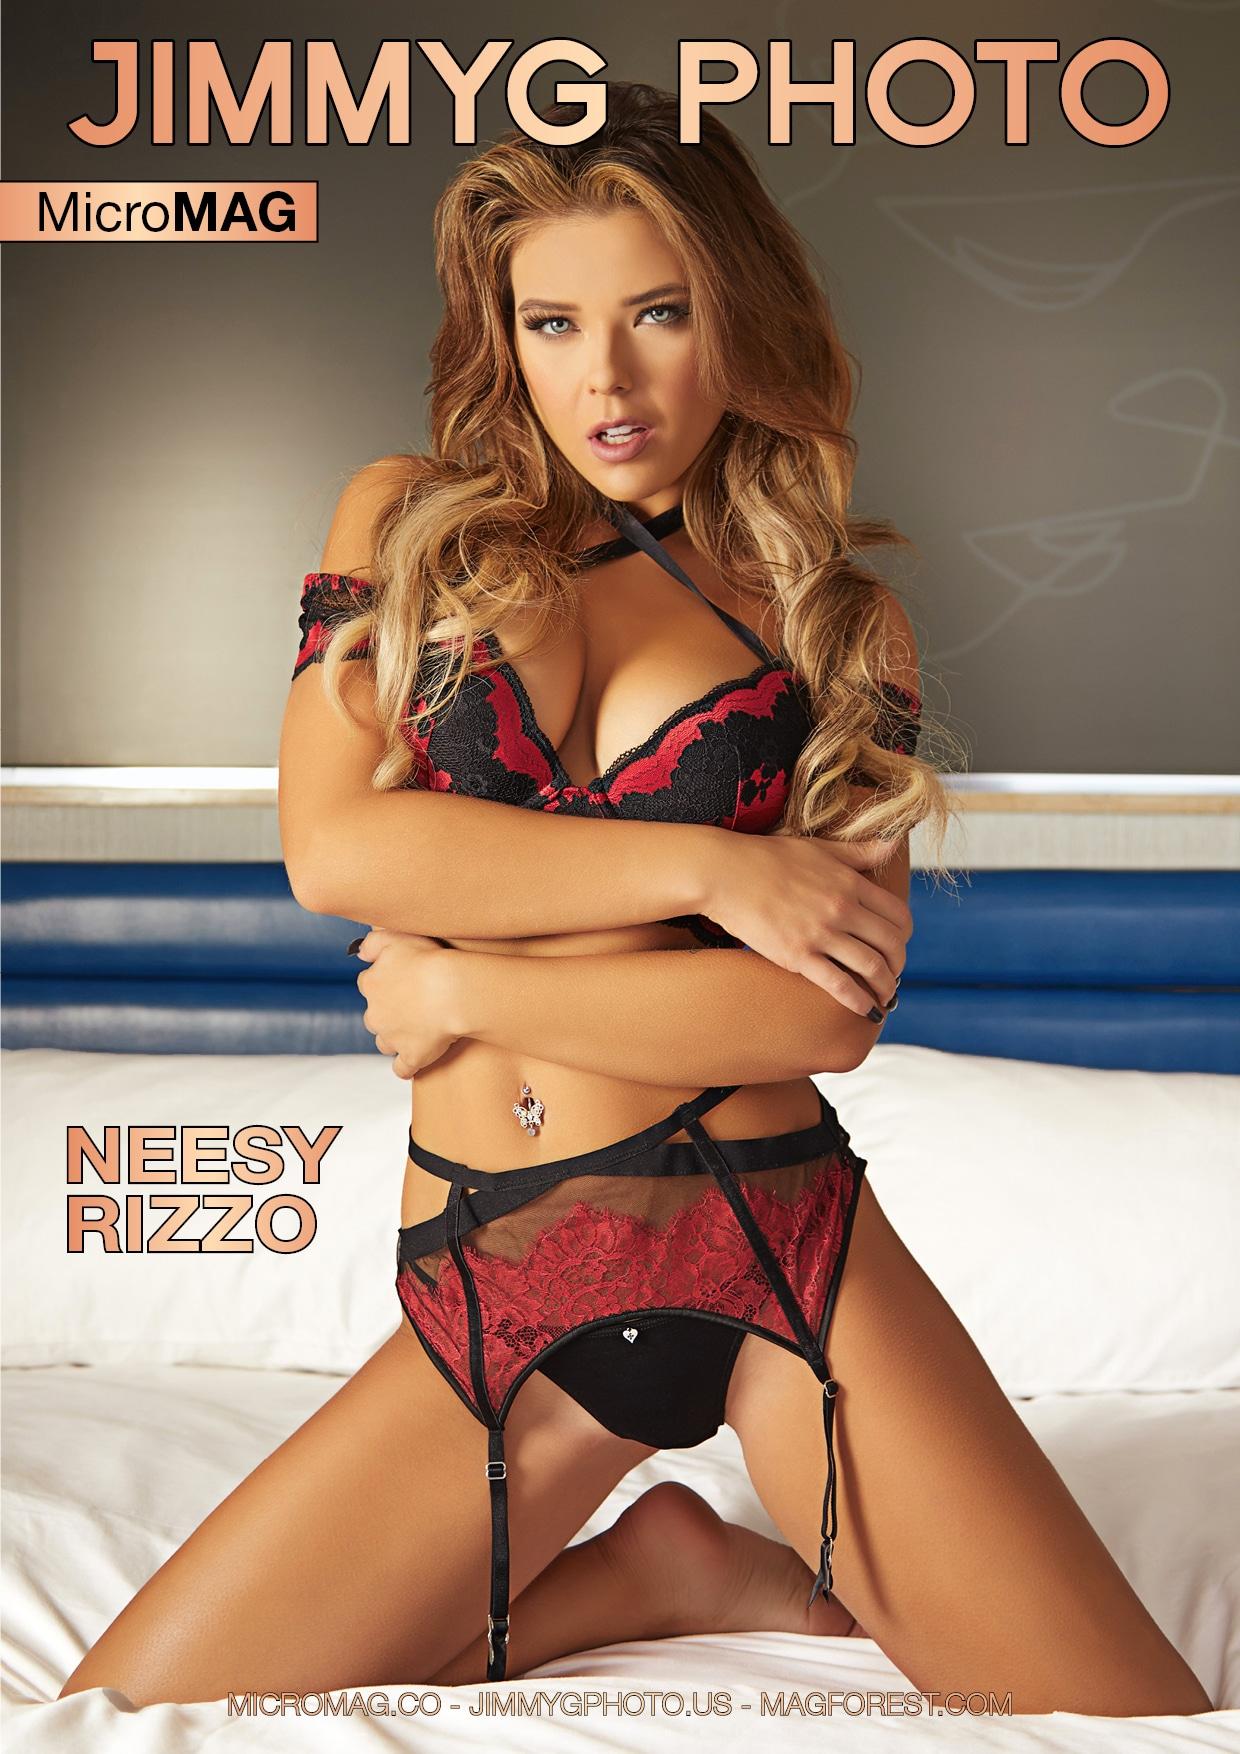 JimmyG Photo MicroMAG - Neesy Rizzo 1